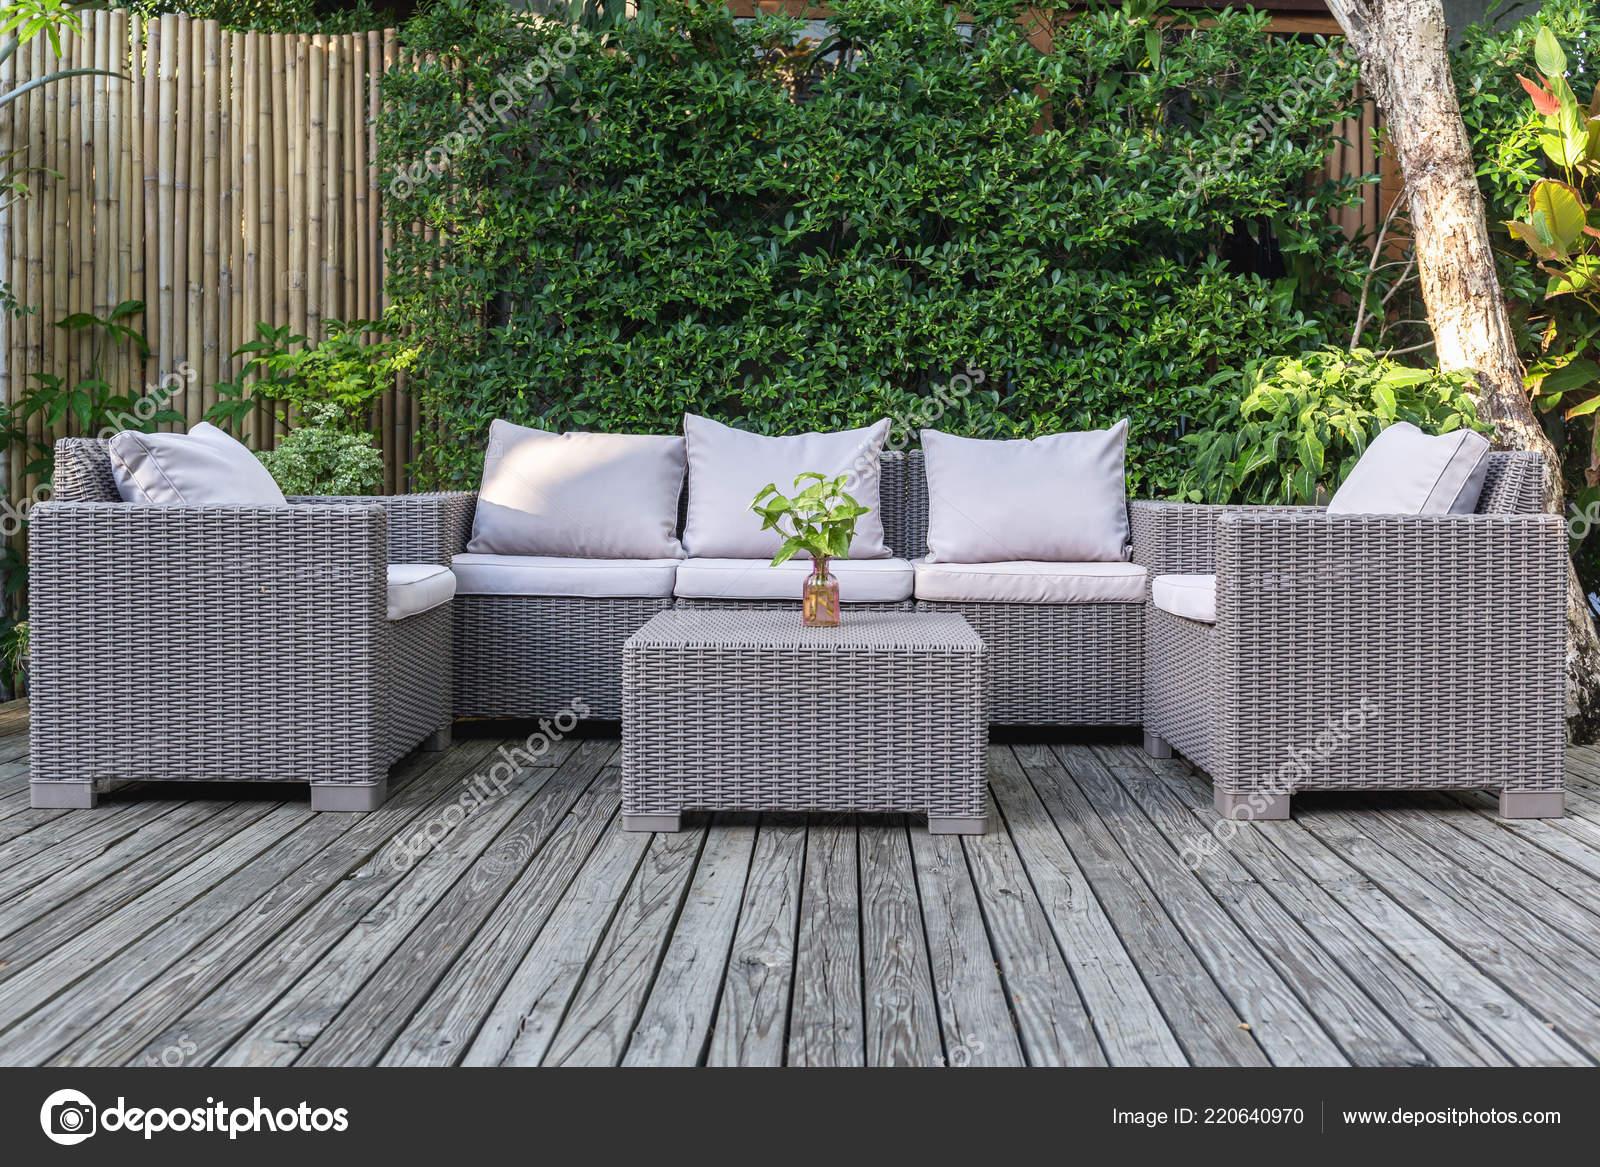 Grande Terrasse Avec Salon Jardin Rotin Dans Jardin Sur Plancher ...